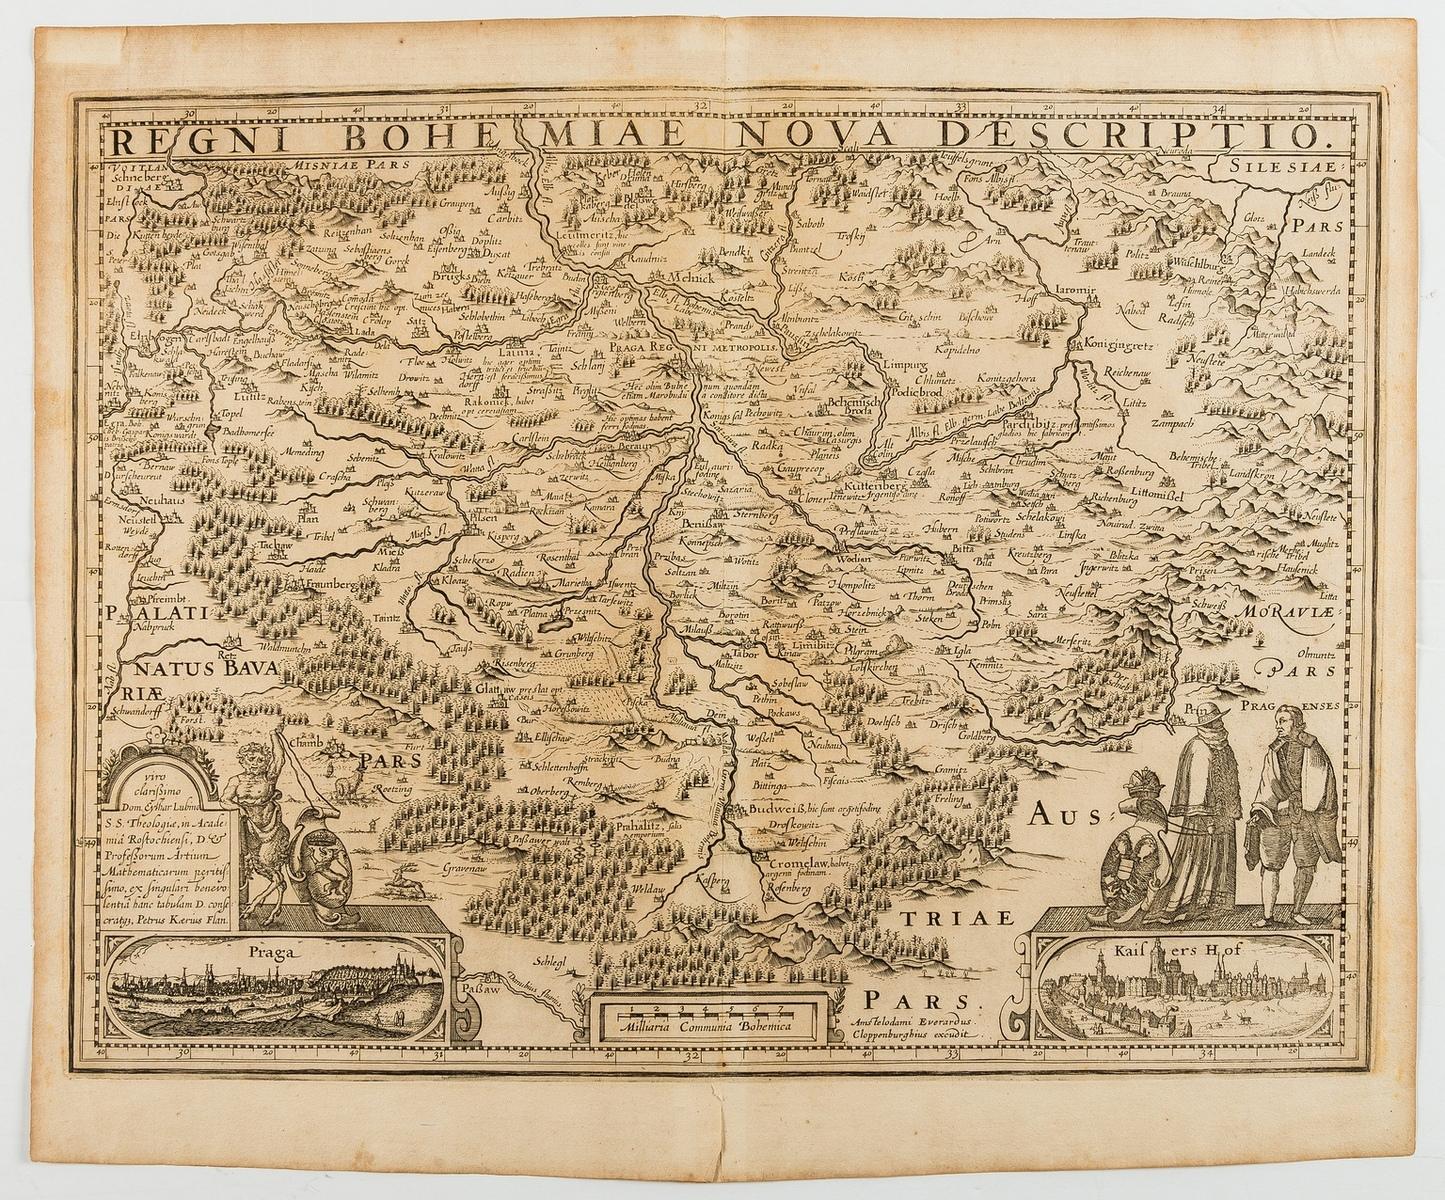 Central & Eastern Europe.- Bohemia.- Cloppenburg (Johannes) Regni Bohemiae Nova Descriptio, …